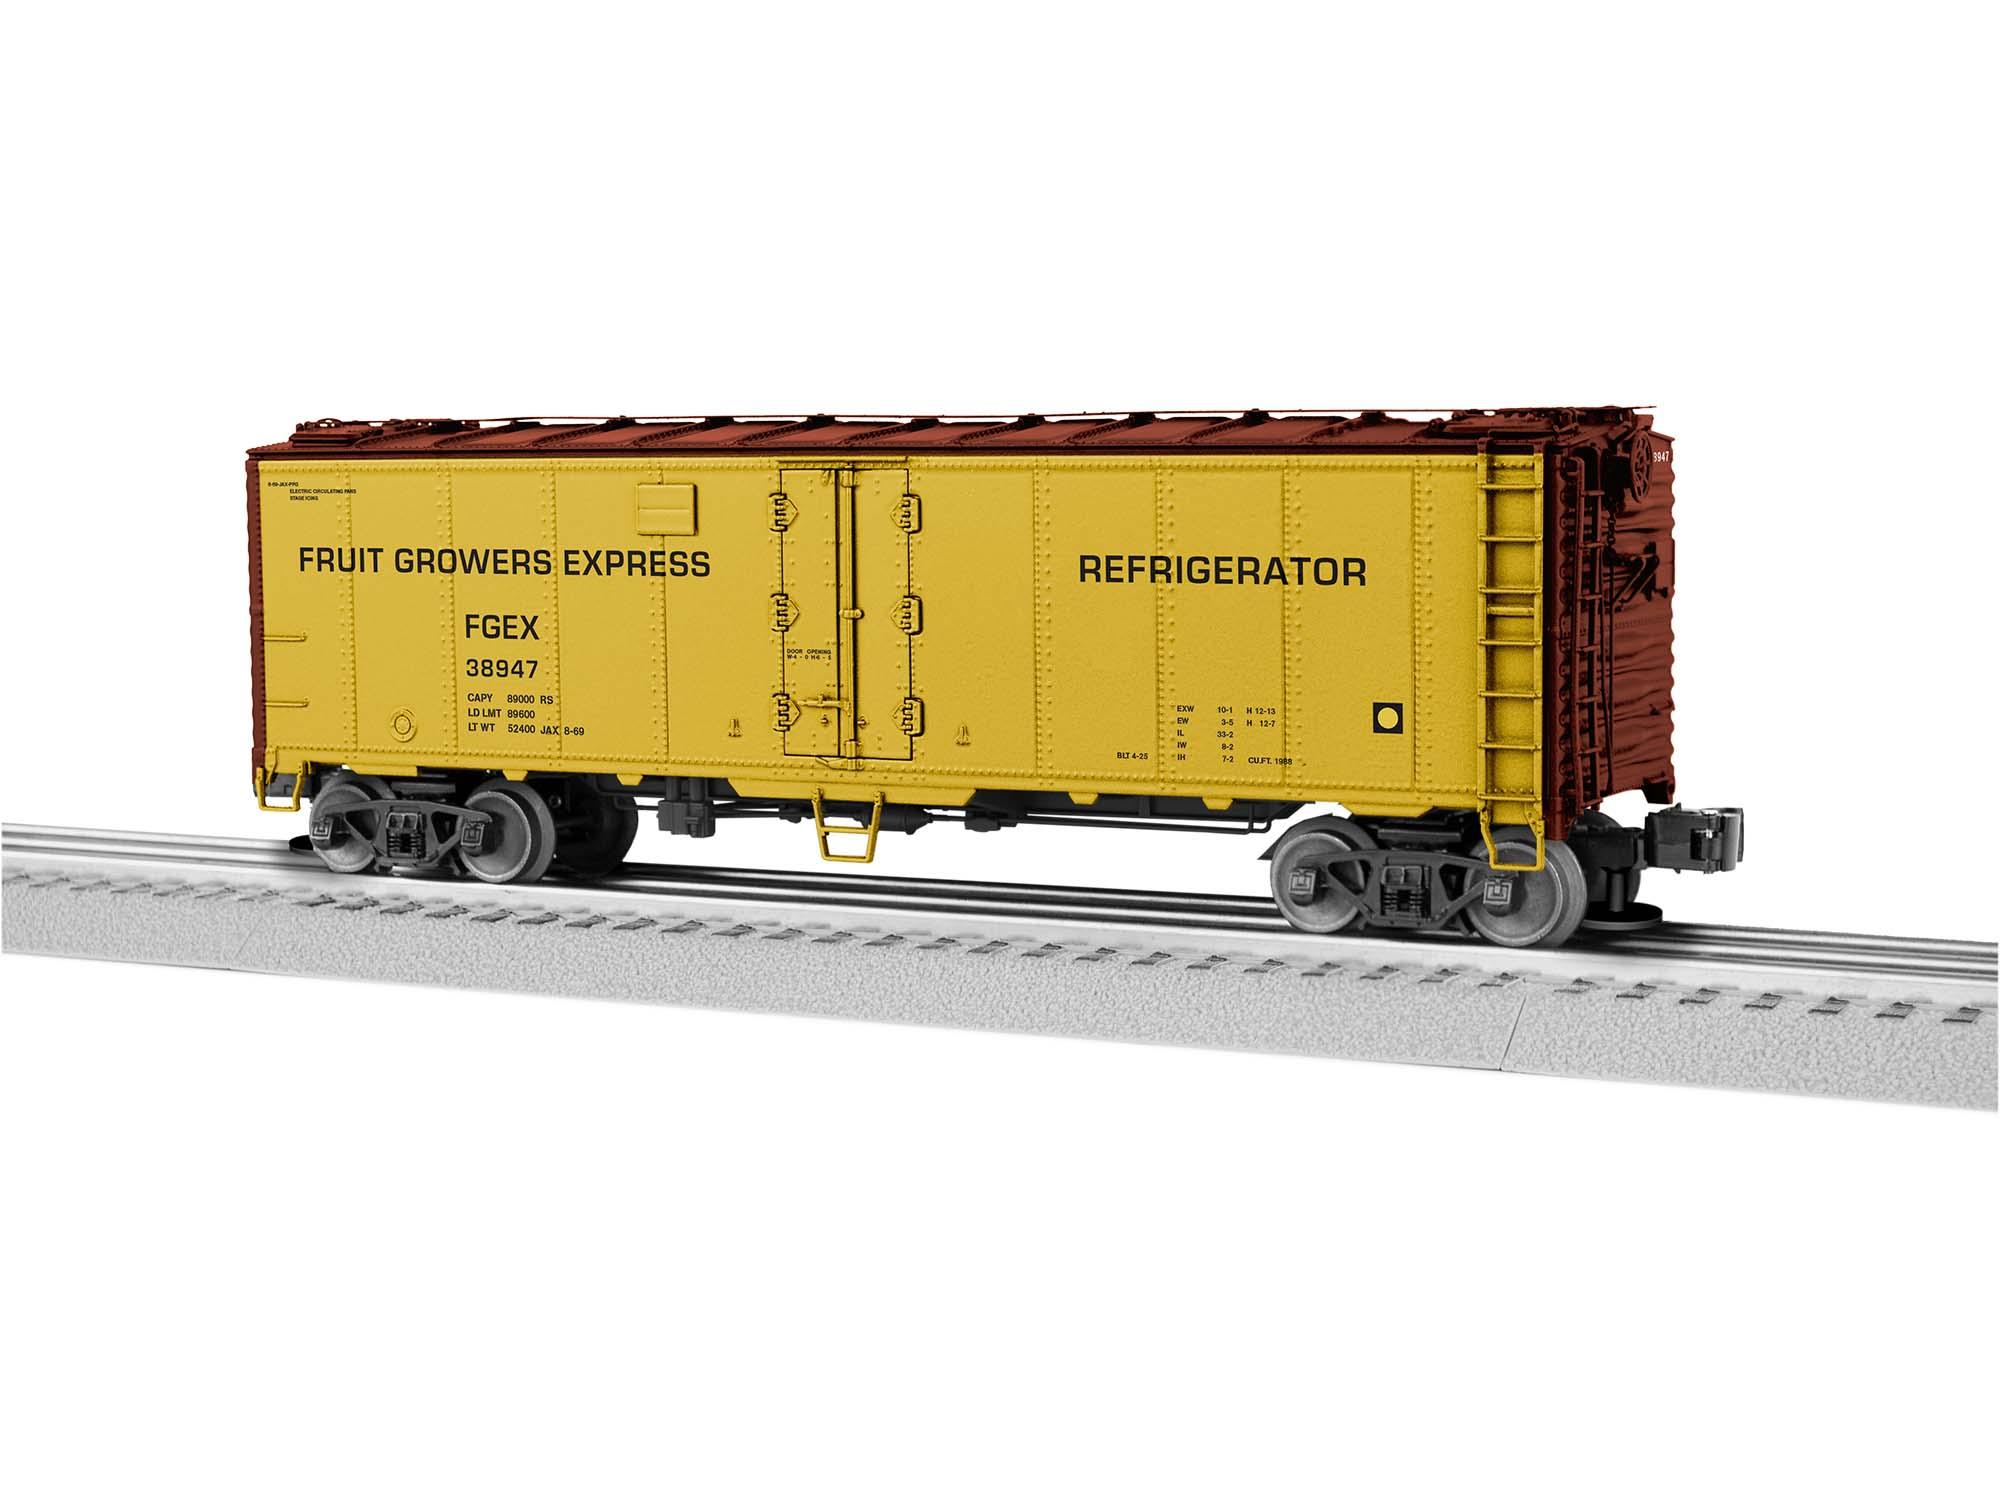 O Reefer w/Freightsound, FGE #38947